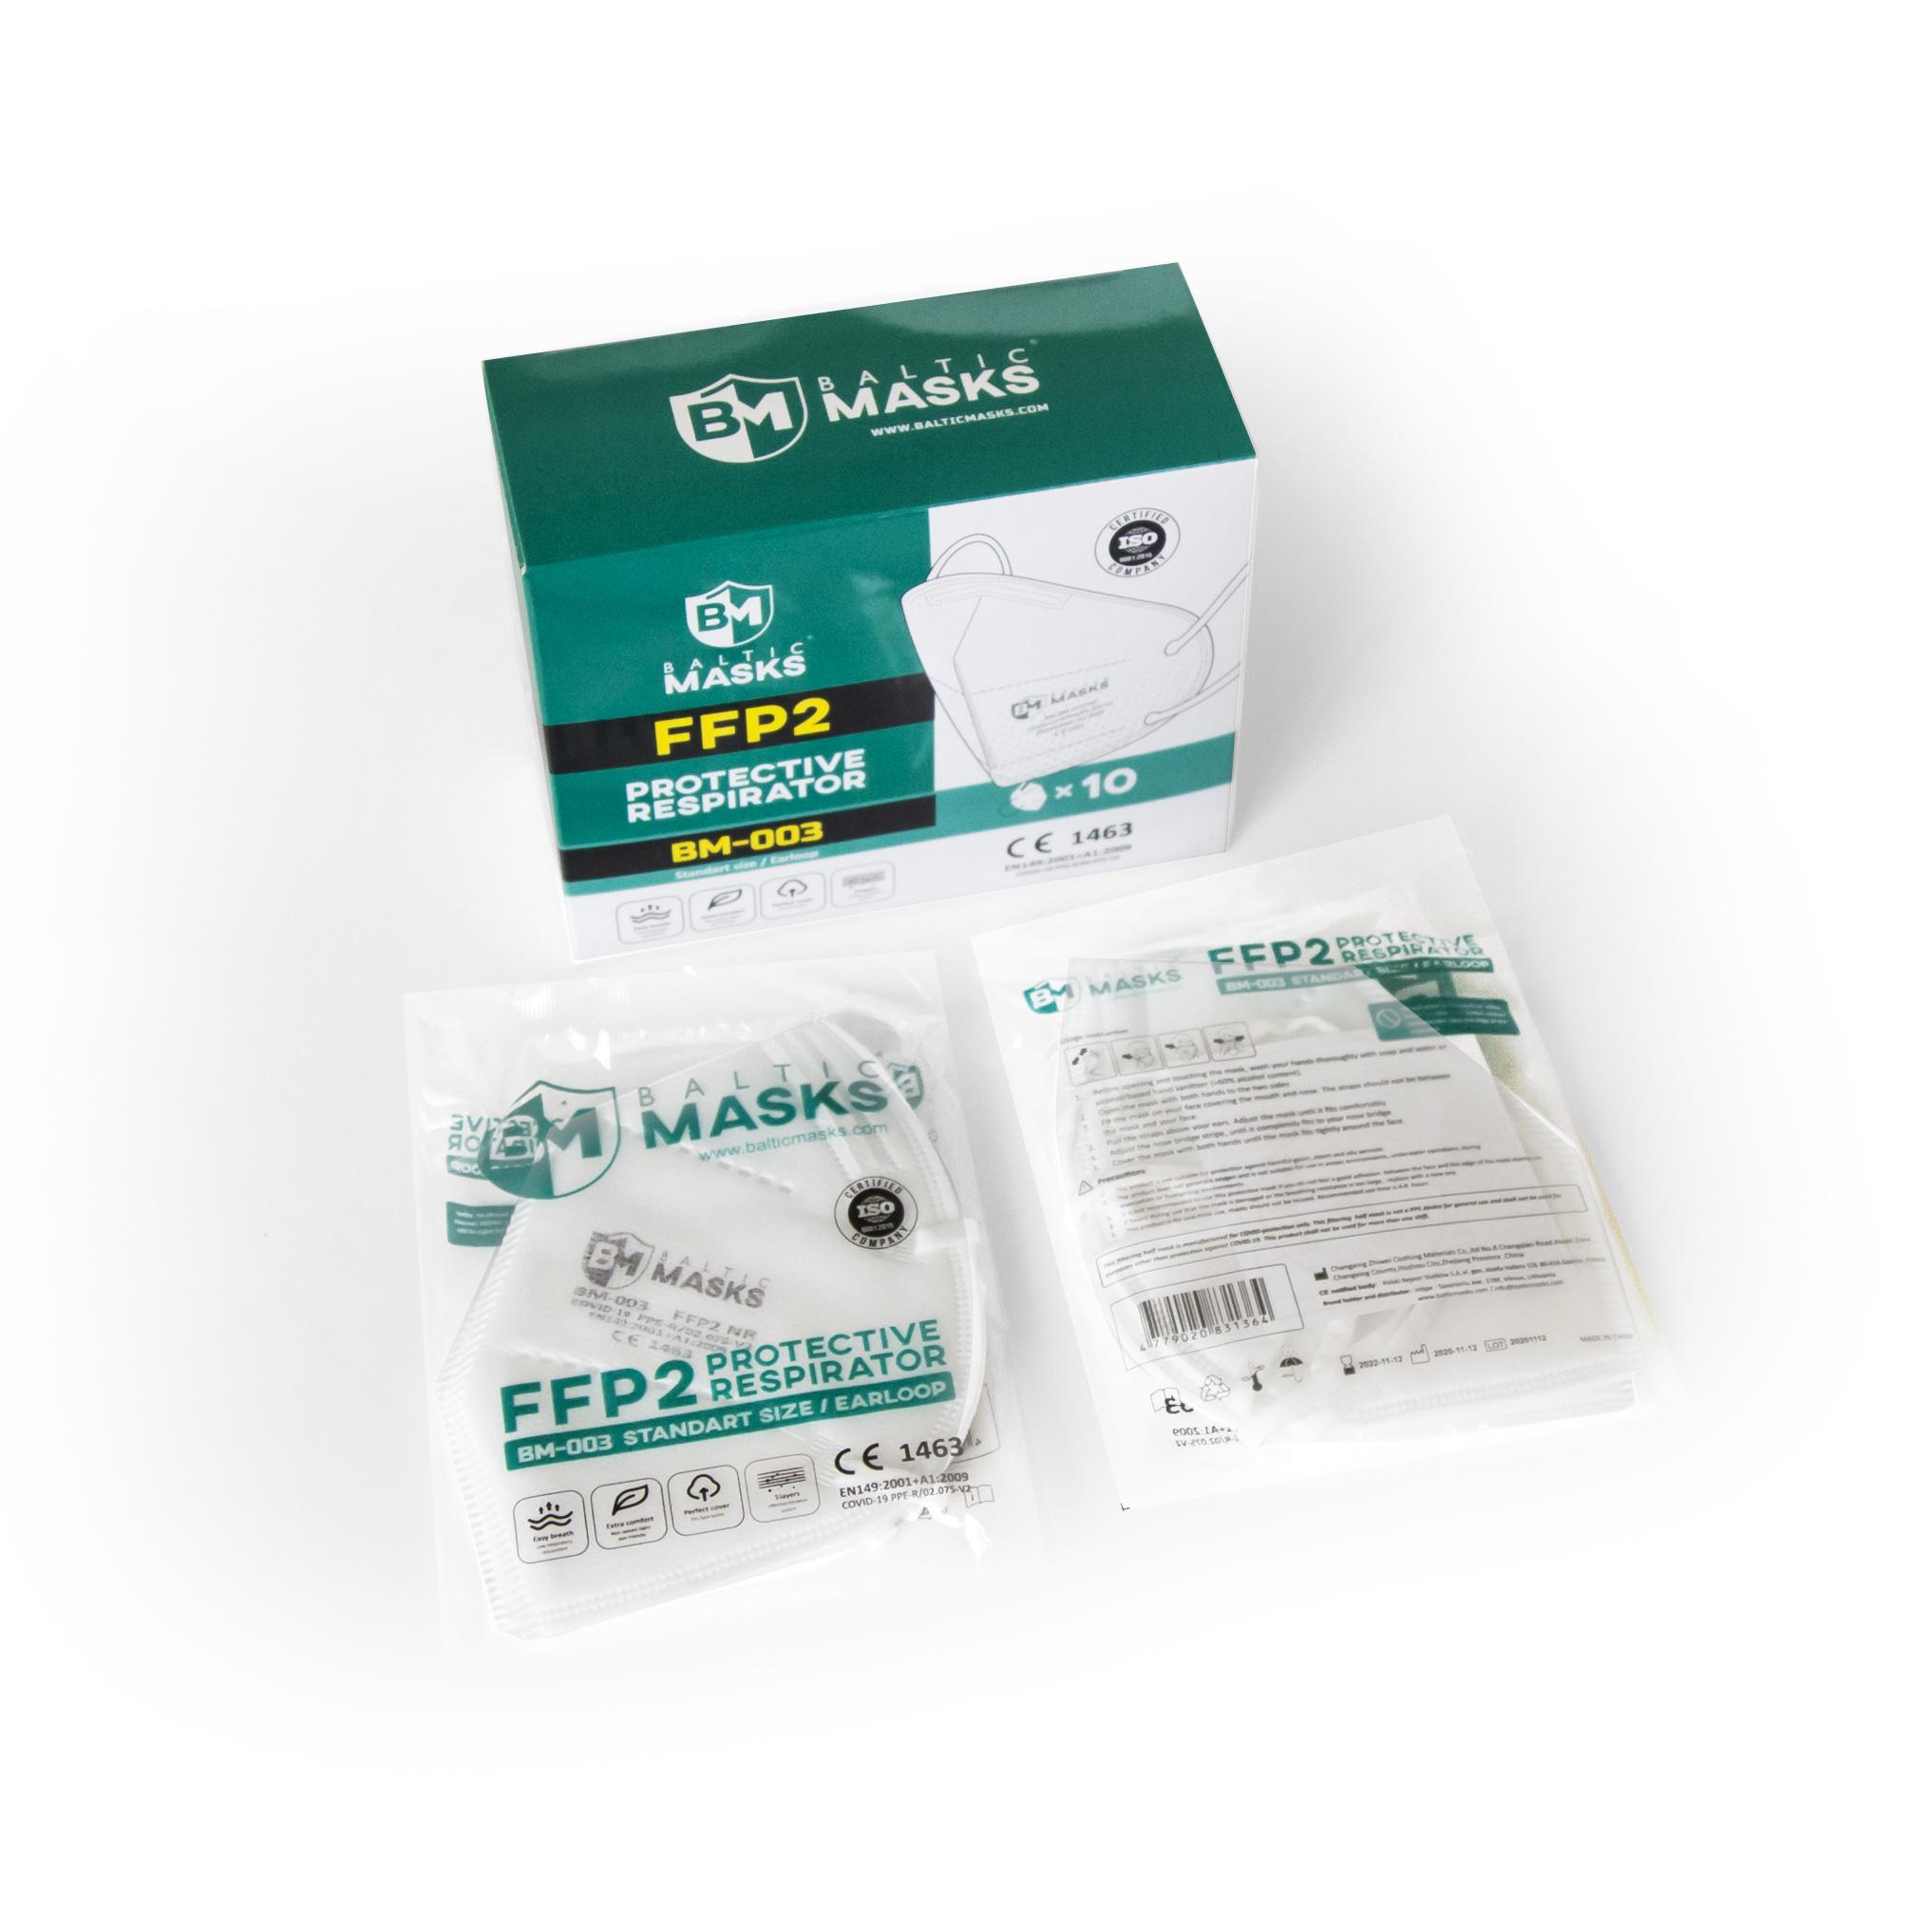 Baltic Masks FFP2 Mondmaskers / Mondkapjes - 10 stuks